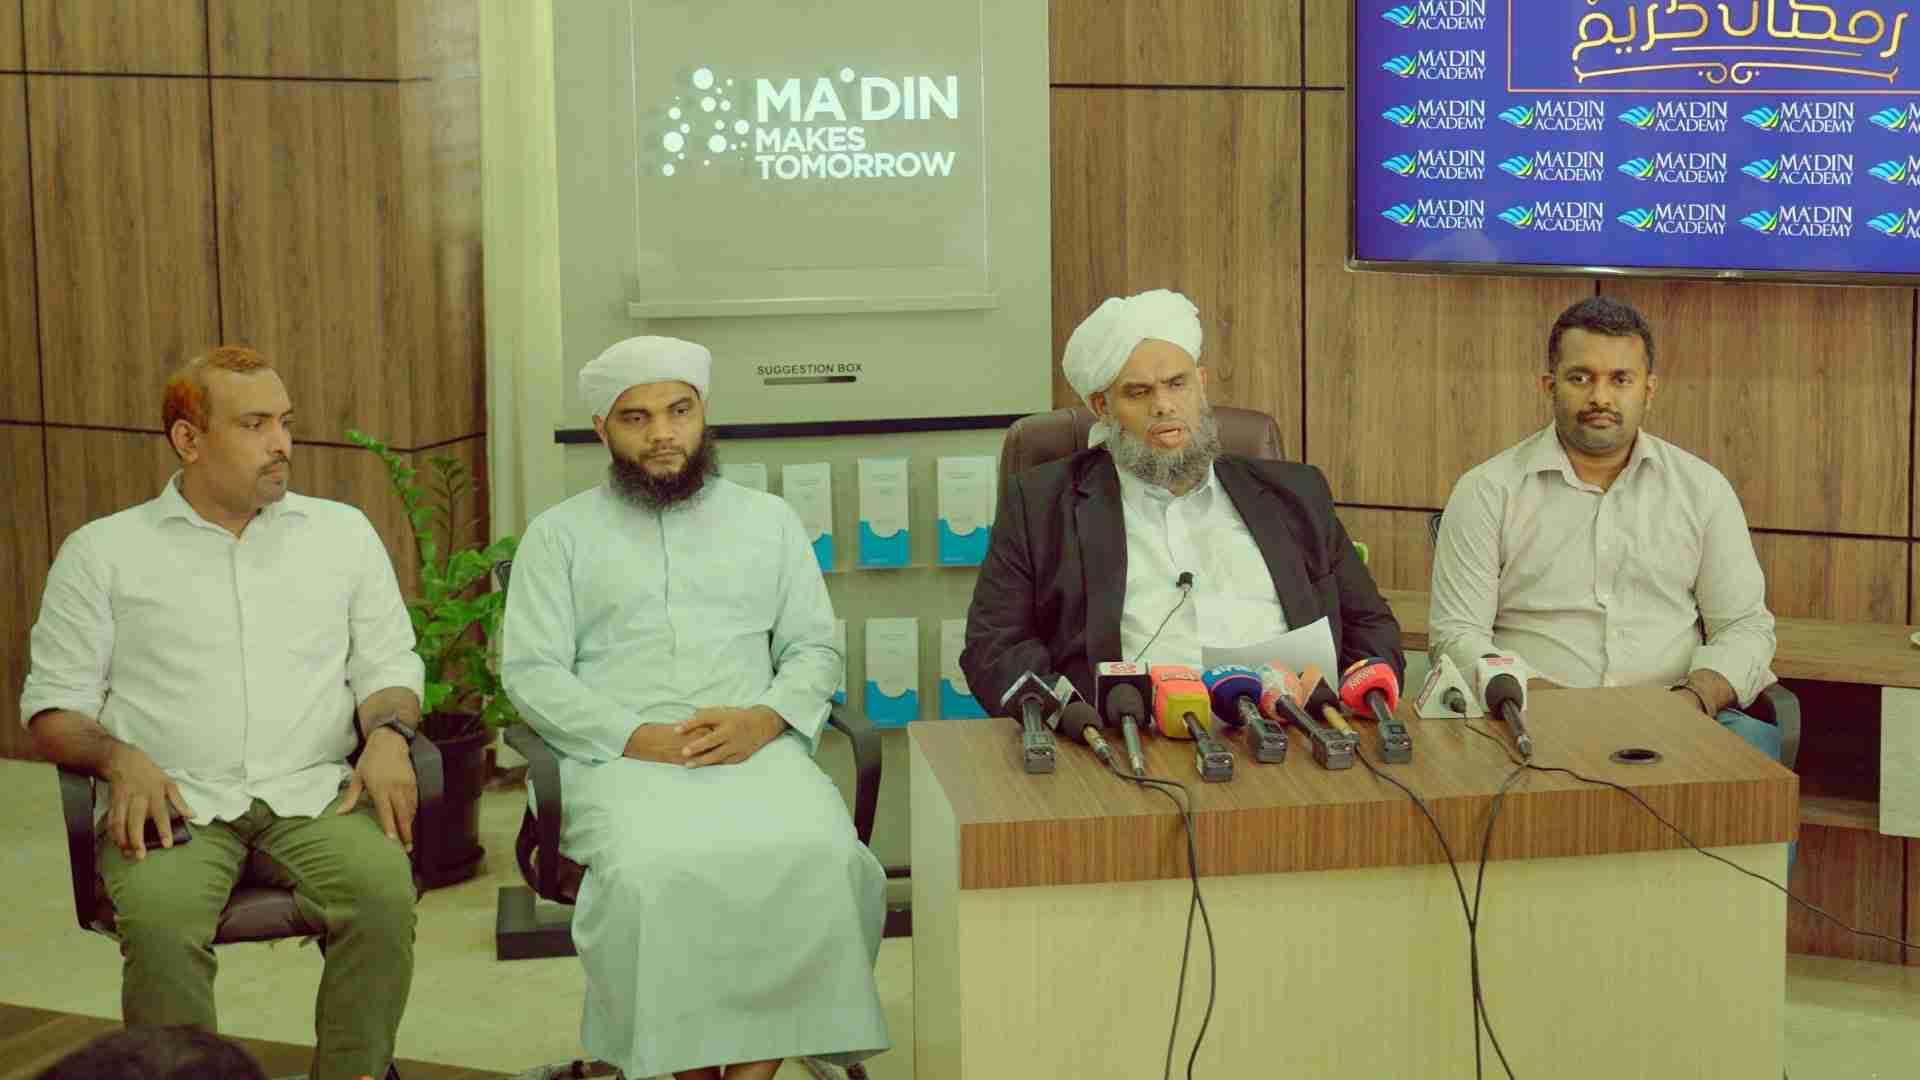 PRESS-MEET-RELESE-PHOTO-ramadan-2021